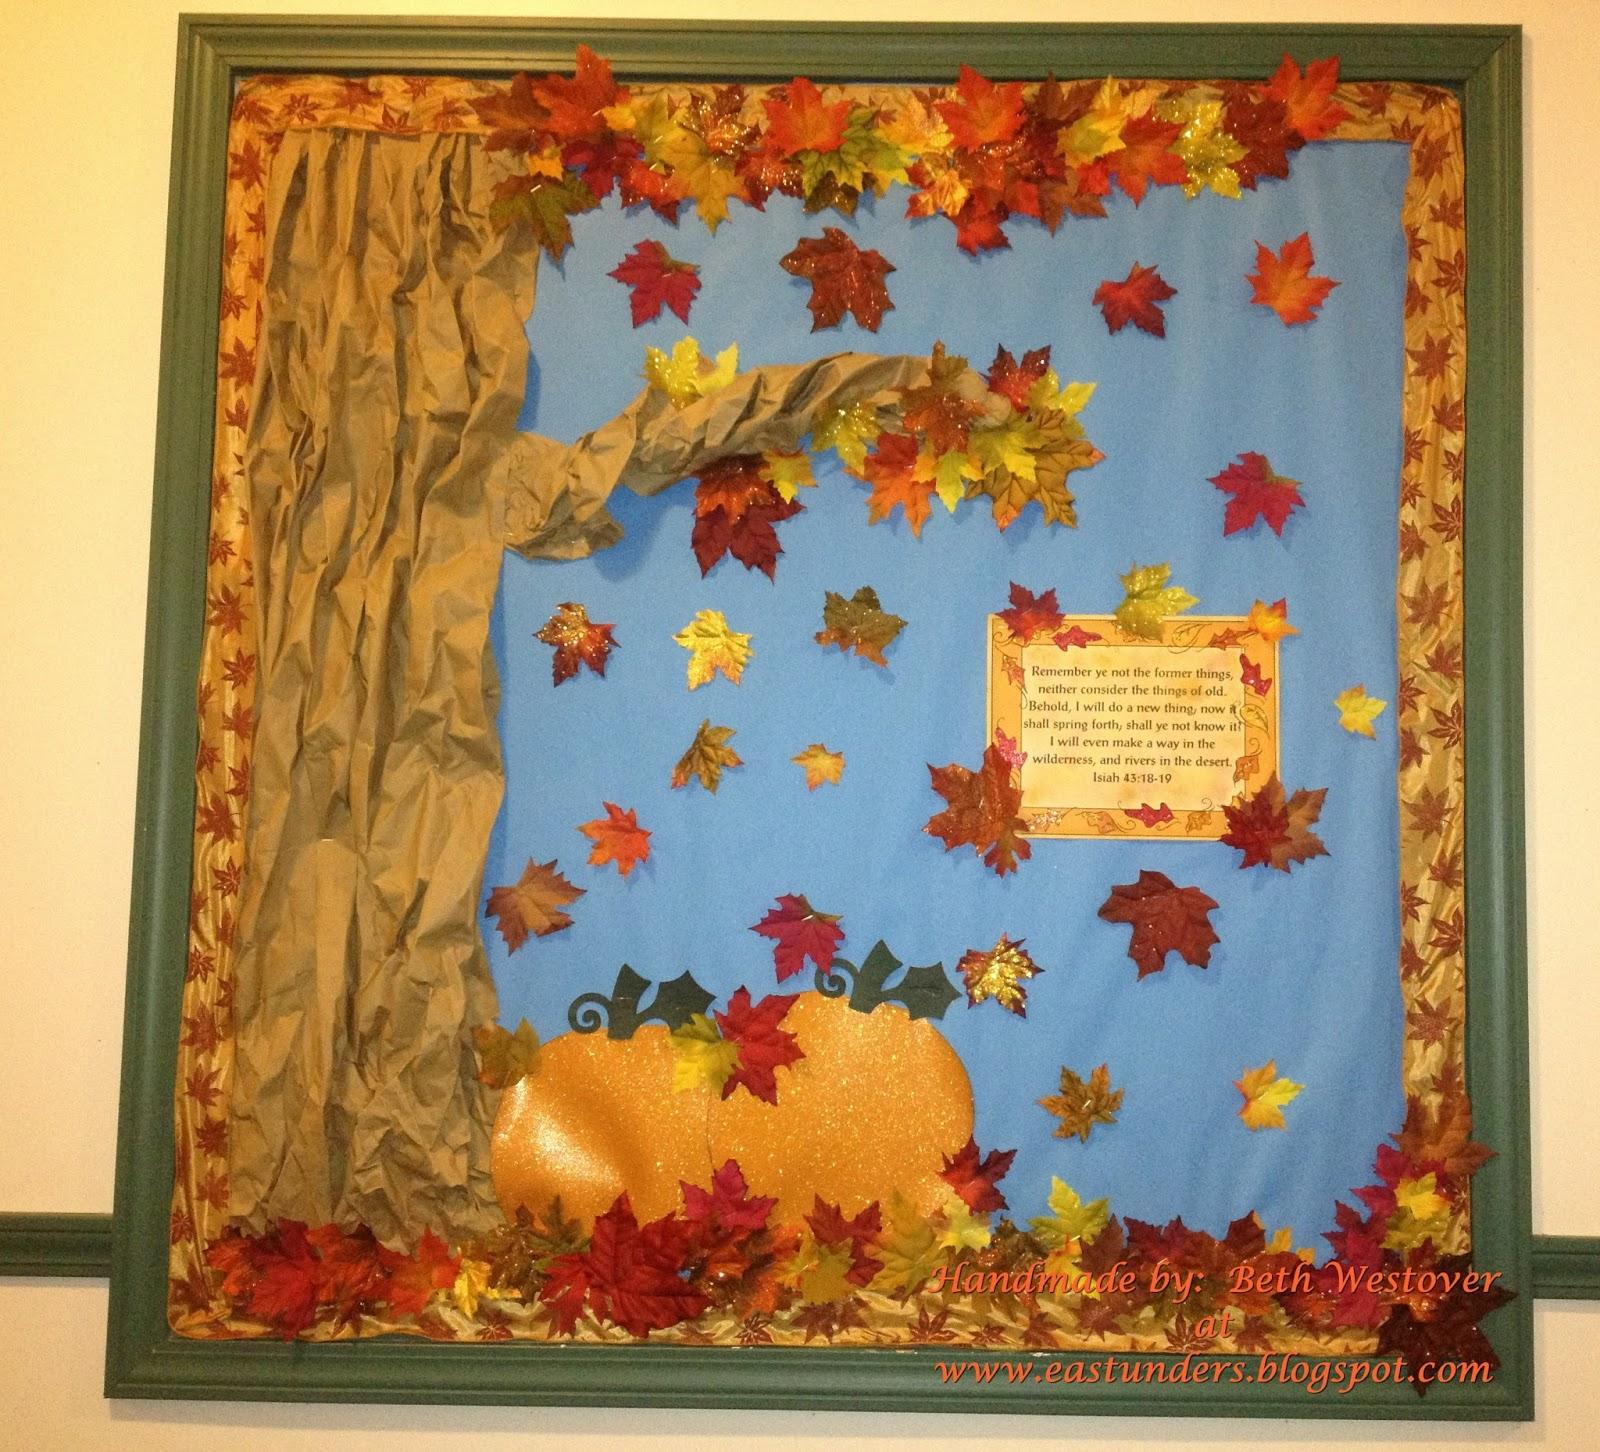 Eastunders creations 2013 fall bulletin boards for Fall bulletin board ideas